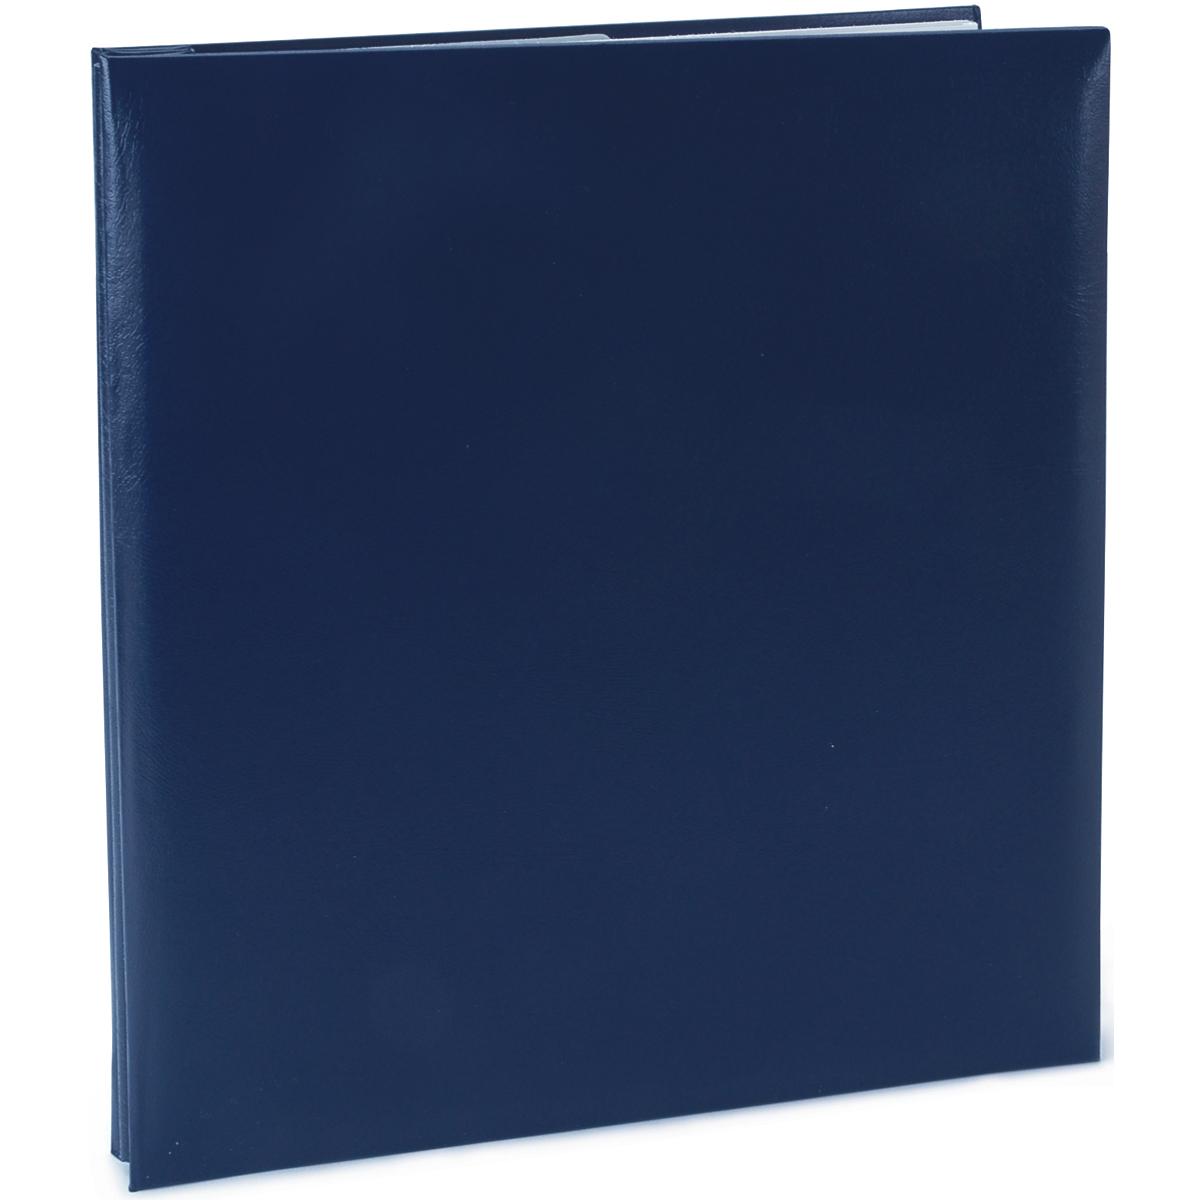 Pioneer LEATHERETTE ALBUM 8.5x11 - Navy Blue